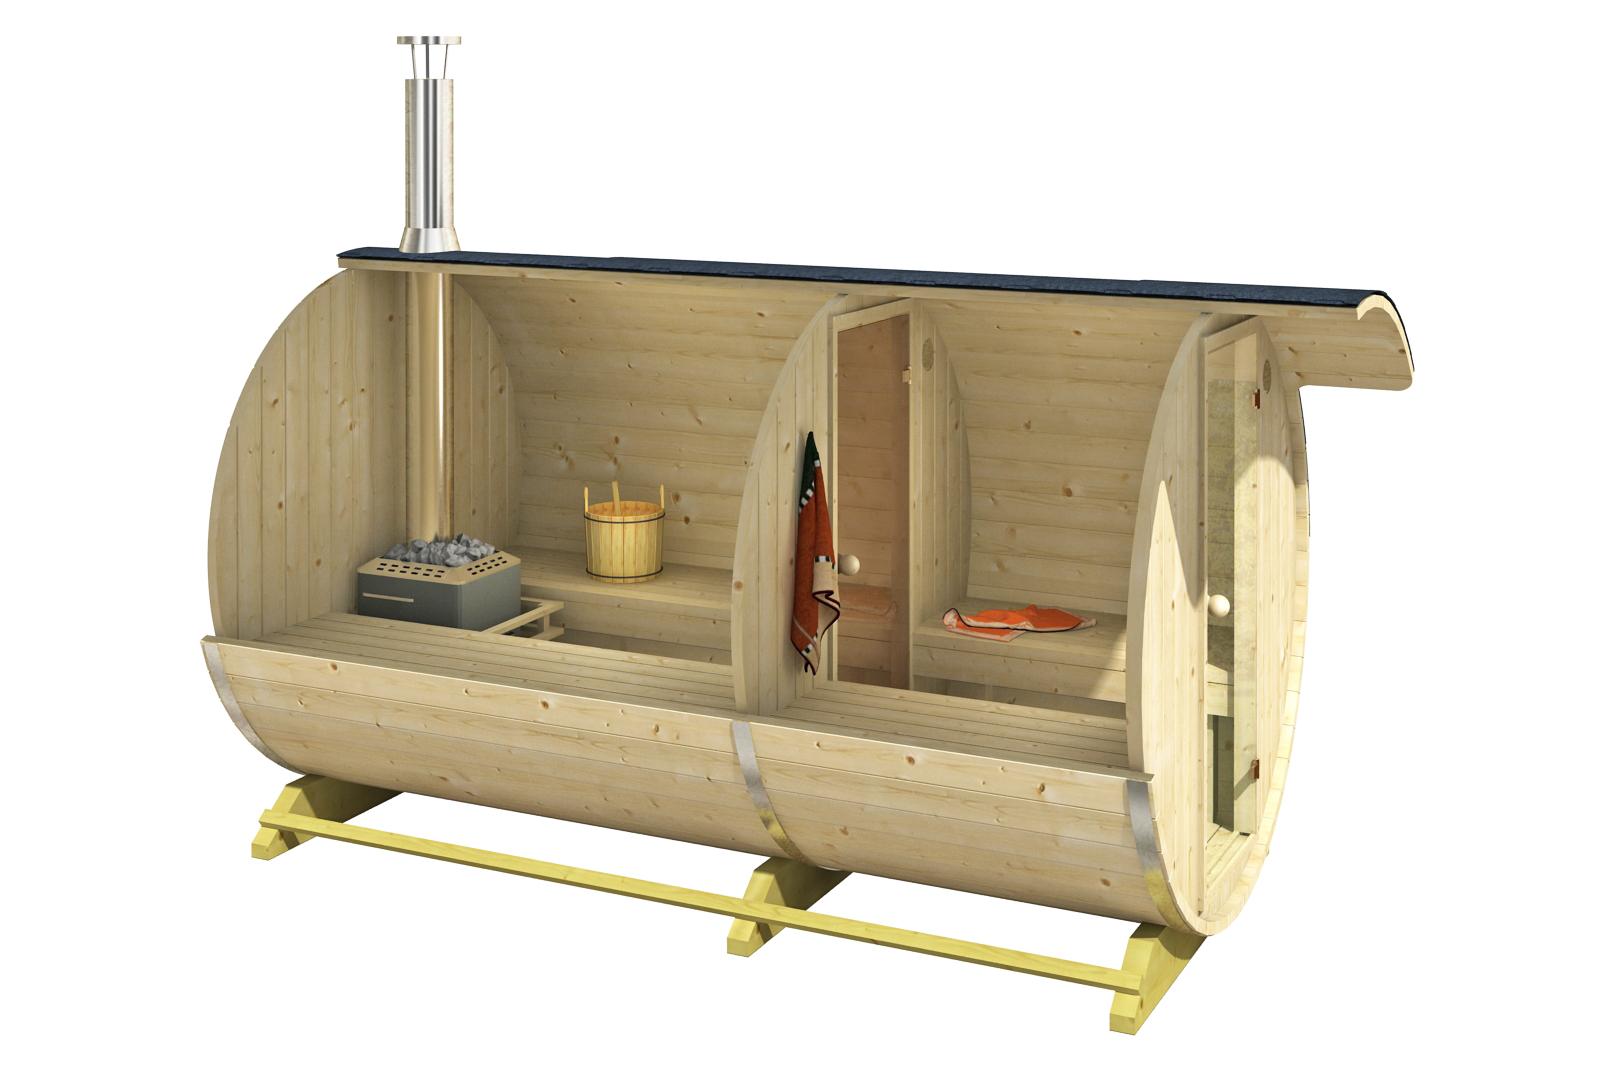 thermoholz 2 raum fass sauna leo mit harvia holz ofen. Black Bedroom Furniture Sets. Home Design Ideas